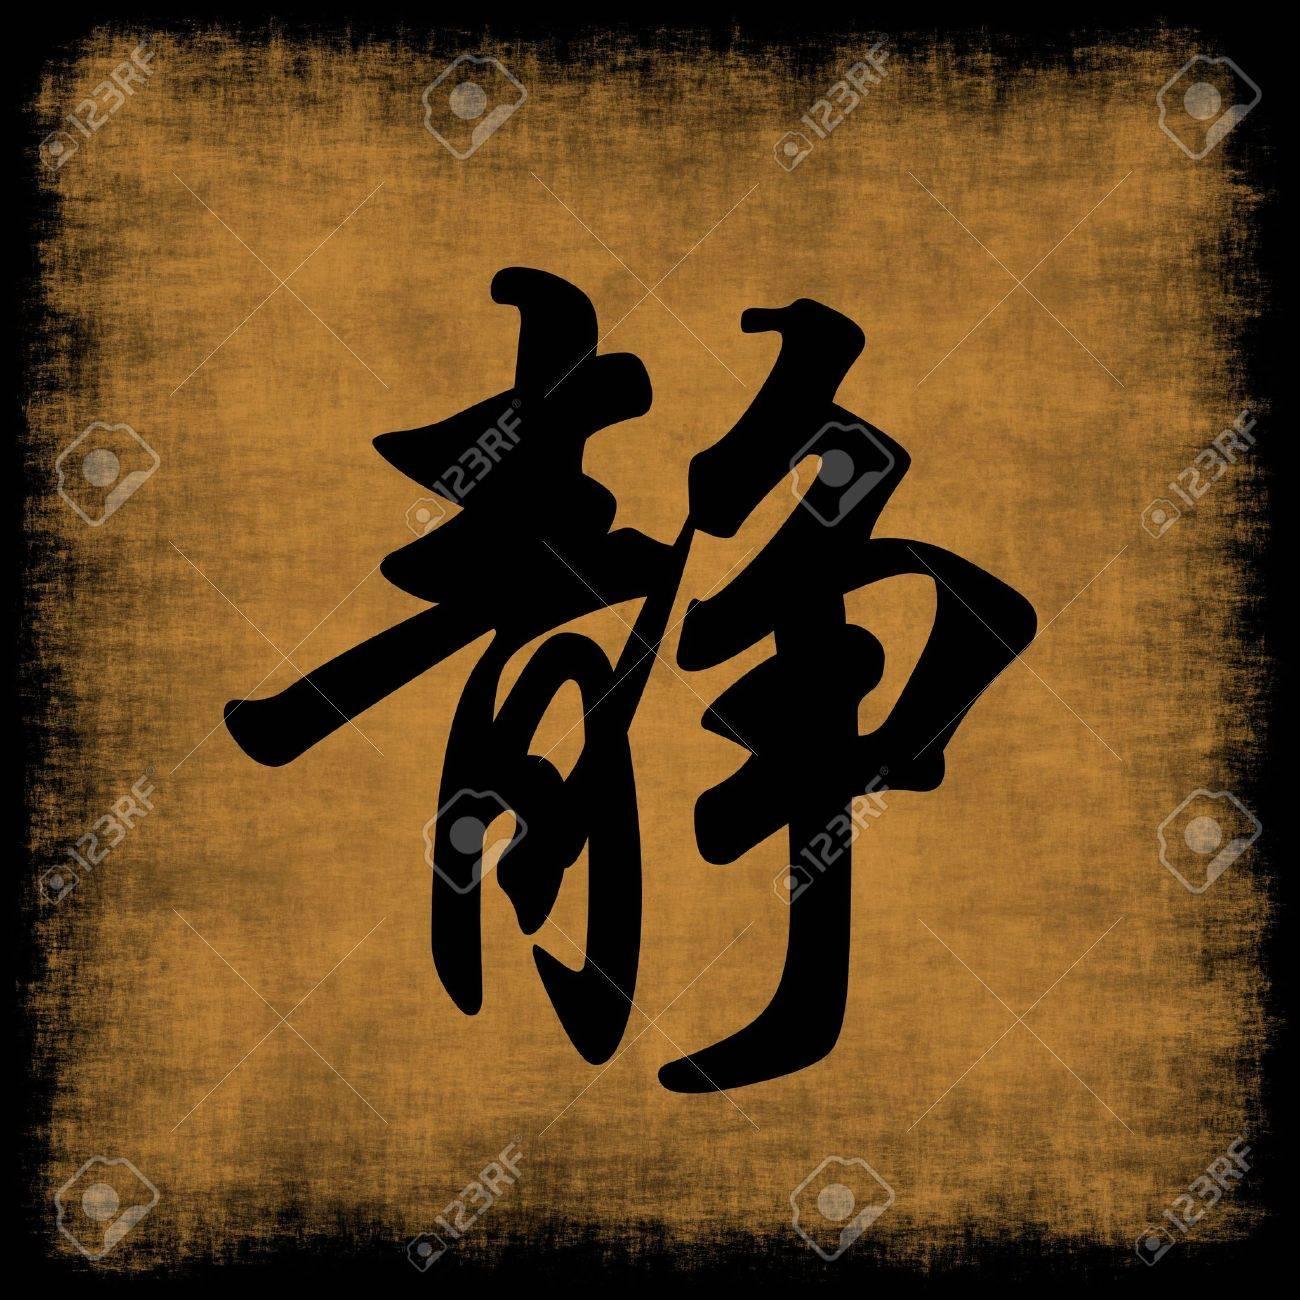 Serenity chinese calligraphy symbol grunge background set stock serenity chinese calligraphy symbol grunge background set stock photo 4657758 buycottarizona Choice Image